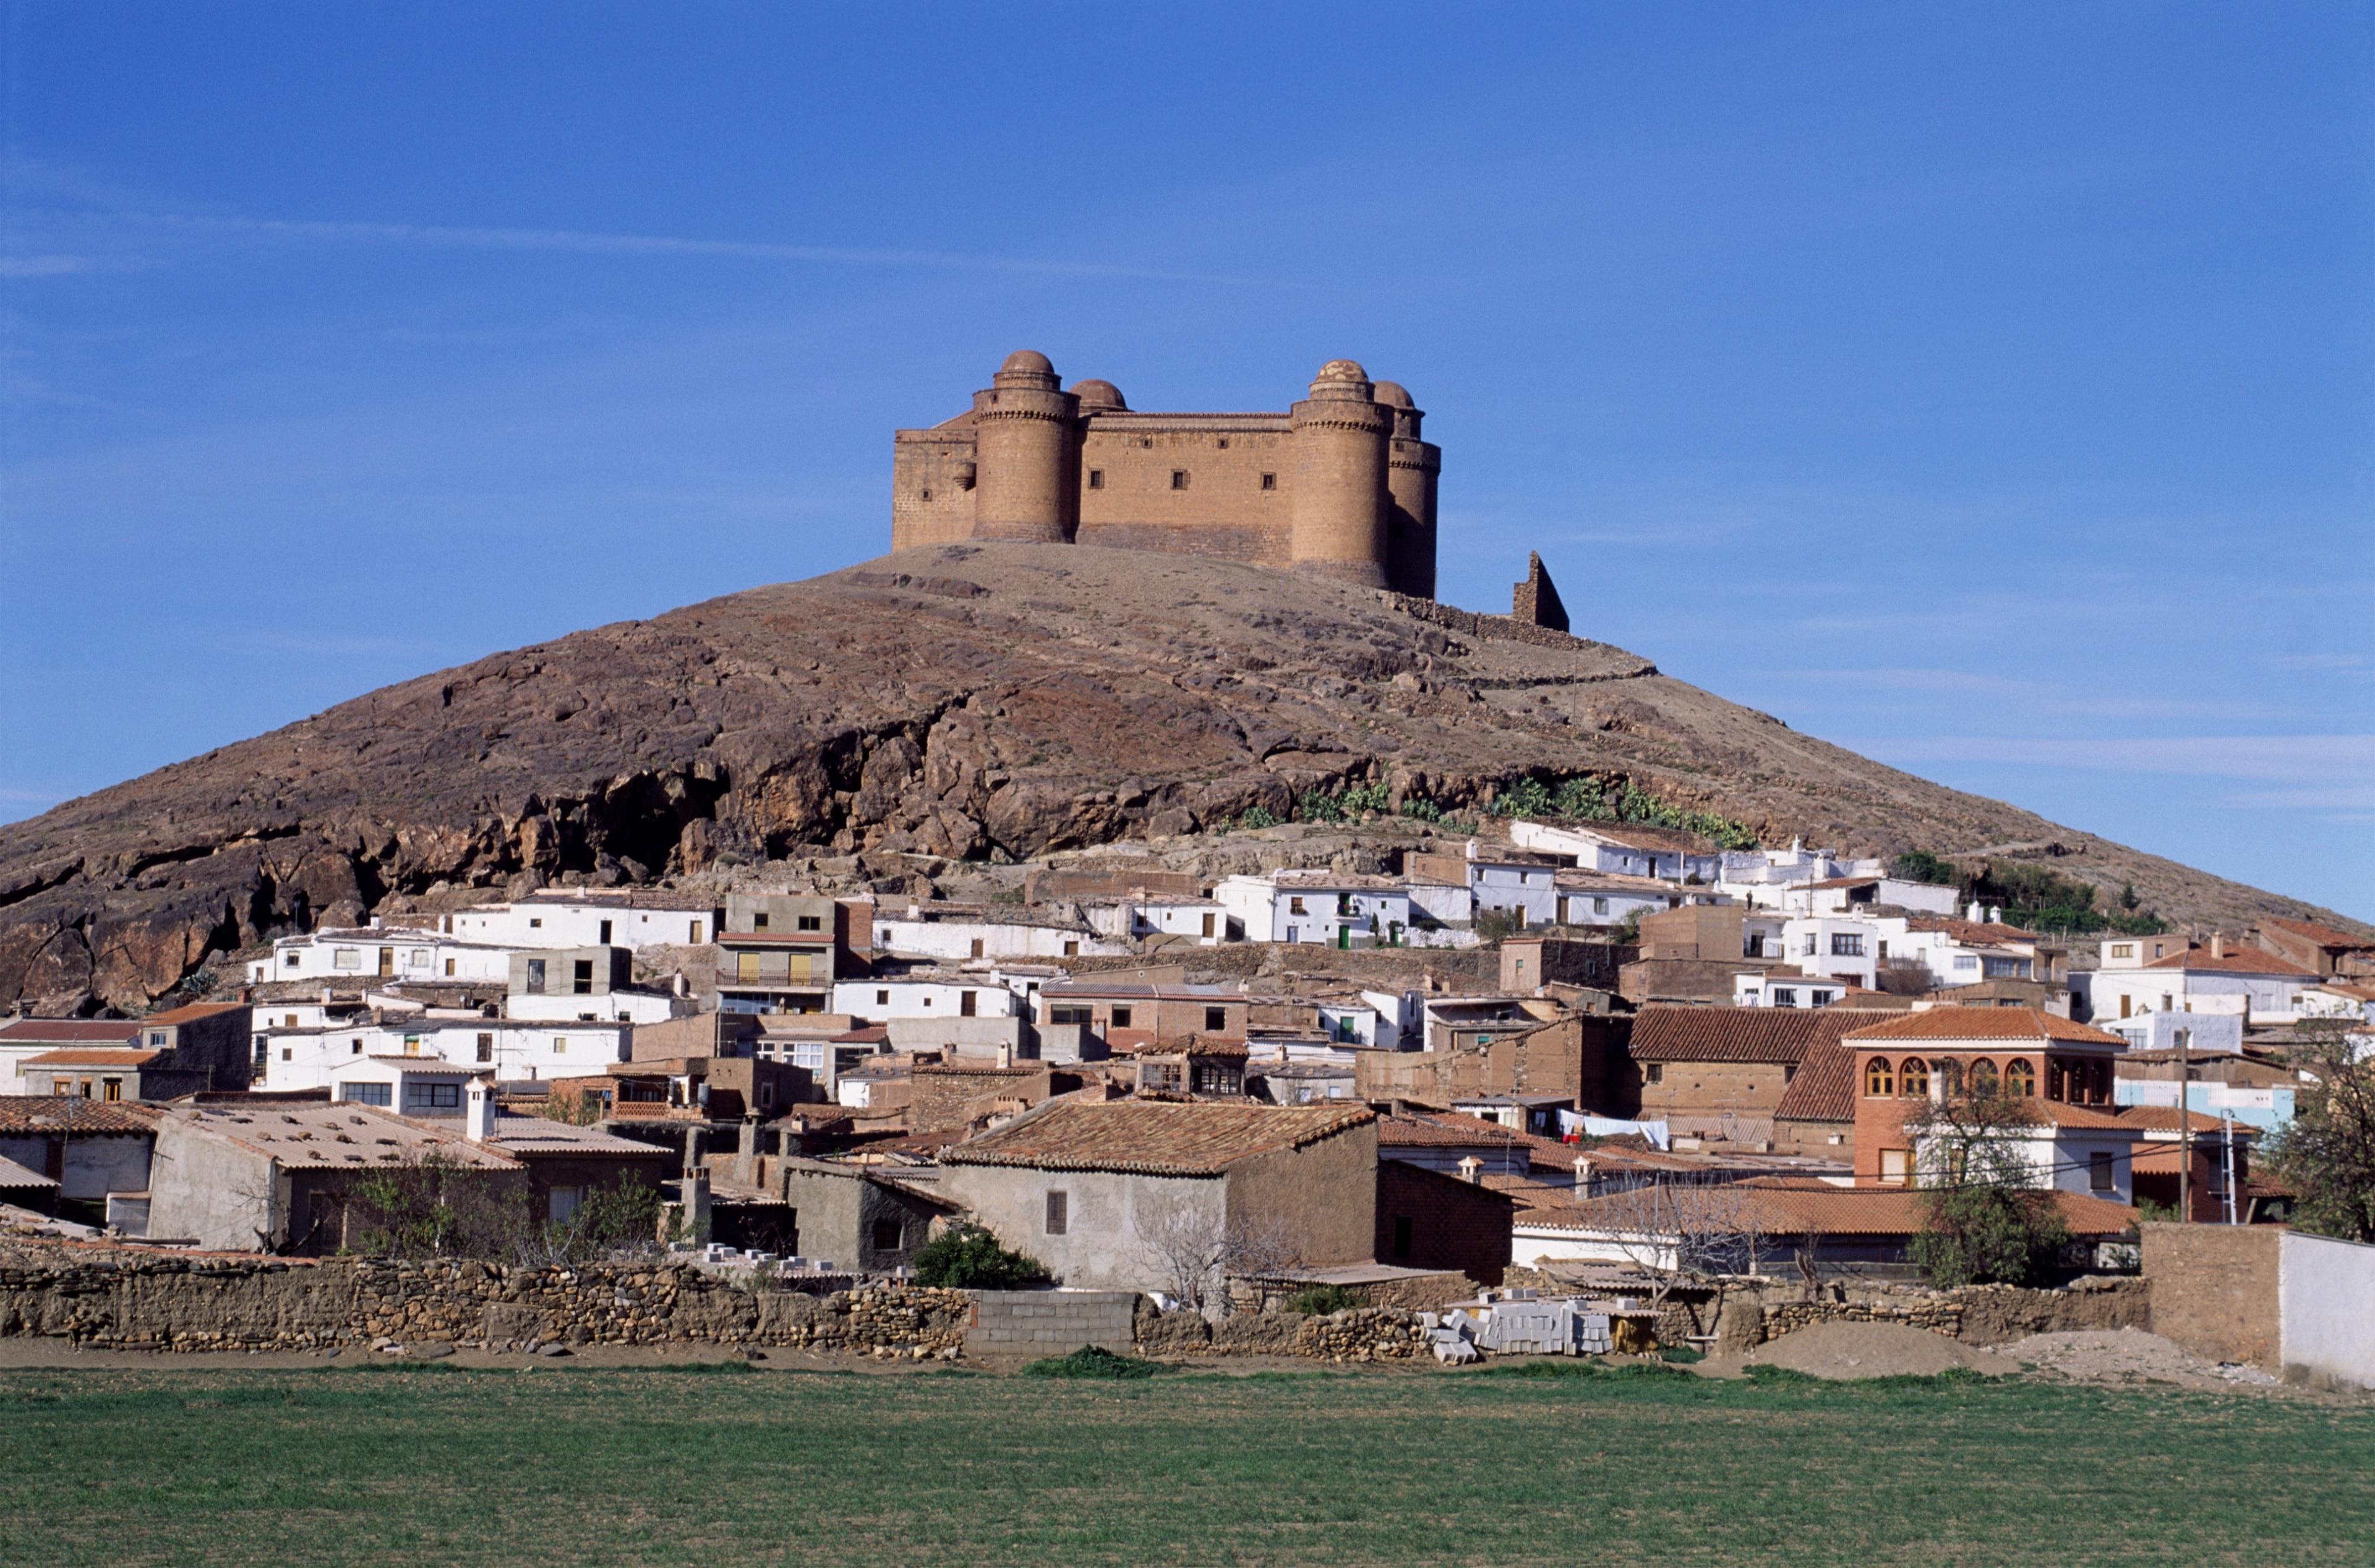 La Calahorra Castle, La Calahorra, Andalusia, Spain